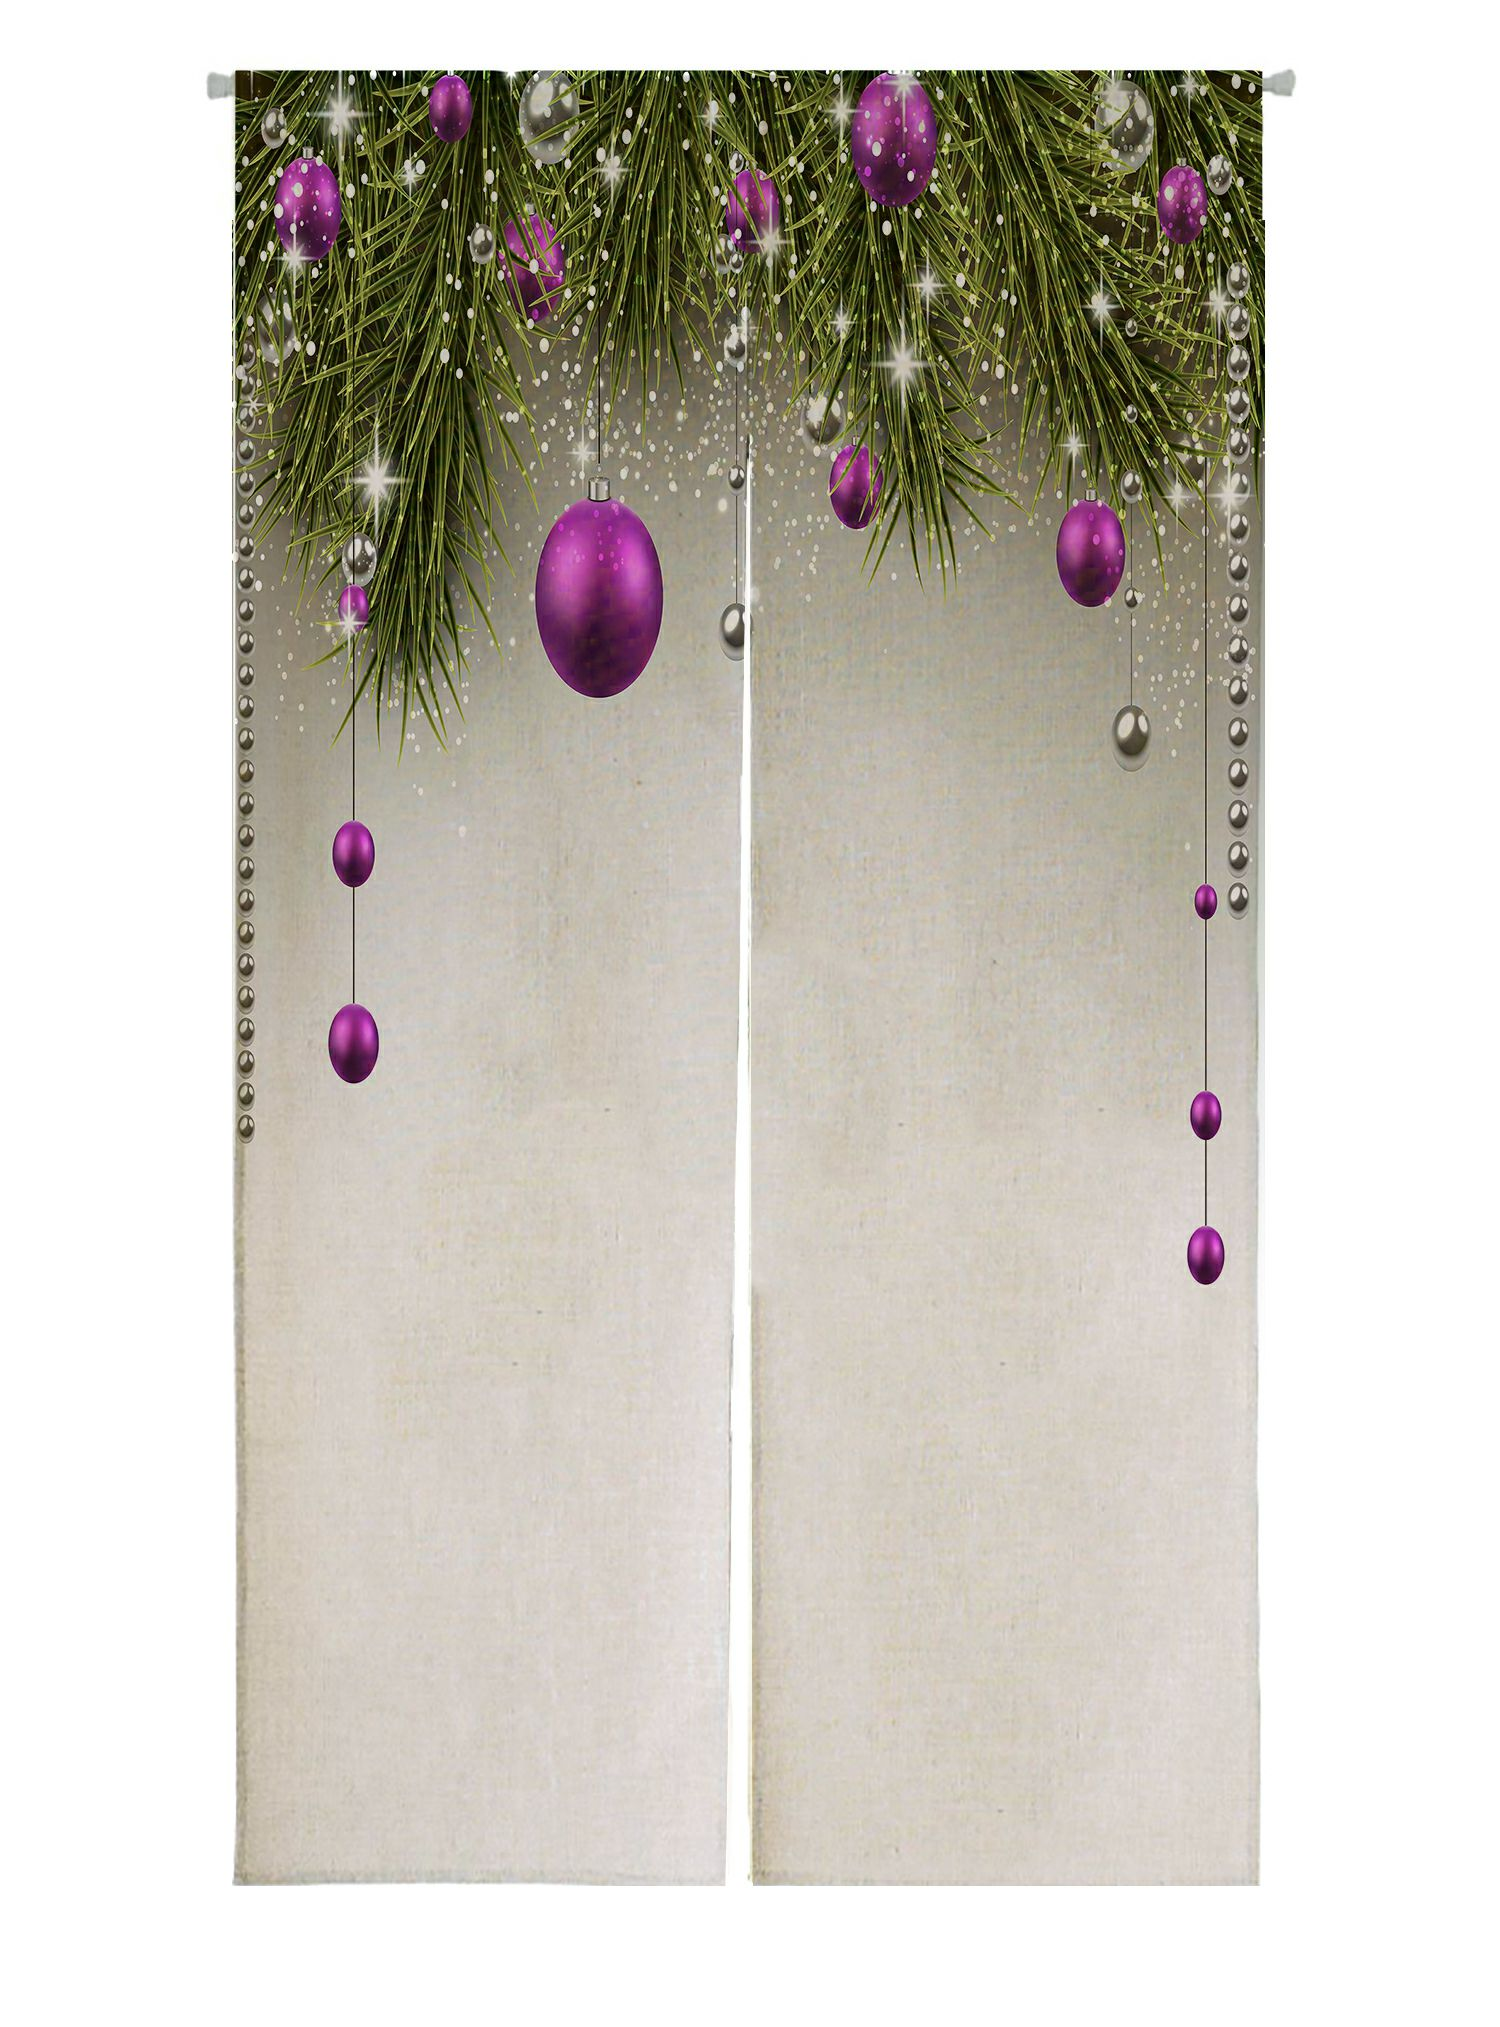 Abphqto Winter Spruce Twigs Purple Baubles Christmas Japanese Noren Curtain Doorway Door Window Treatment Curtains Cotton Linen Curtain 85x90 Cm Walmart Com Walmart Com